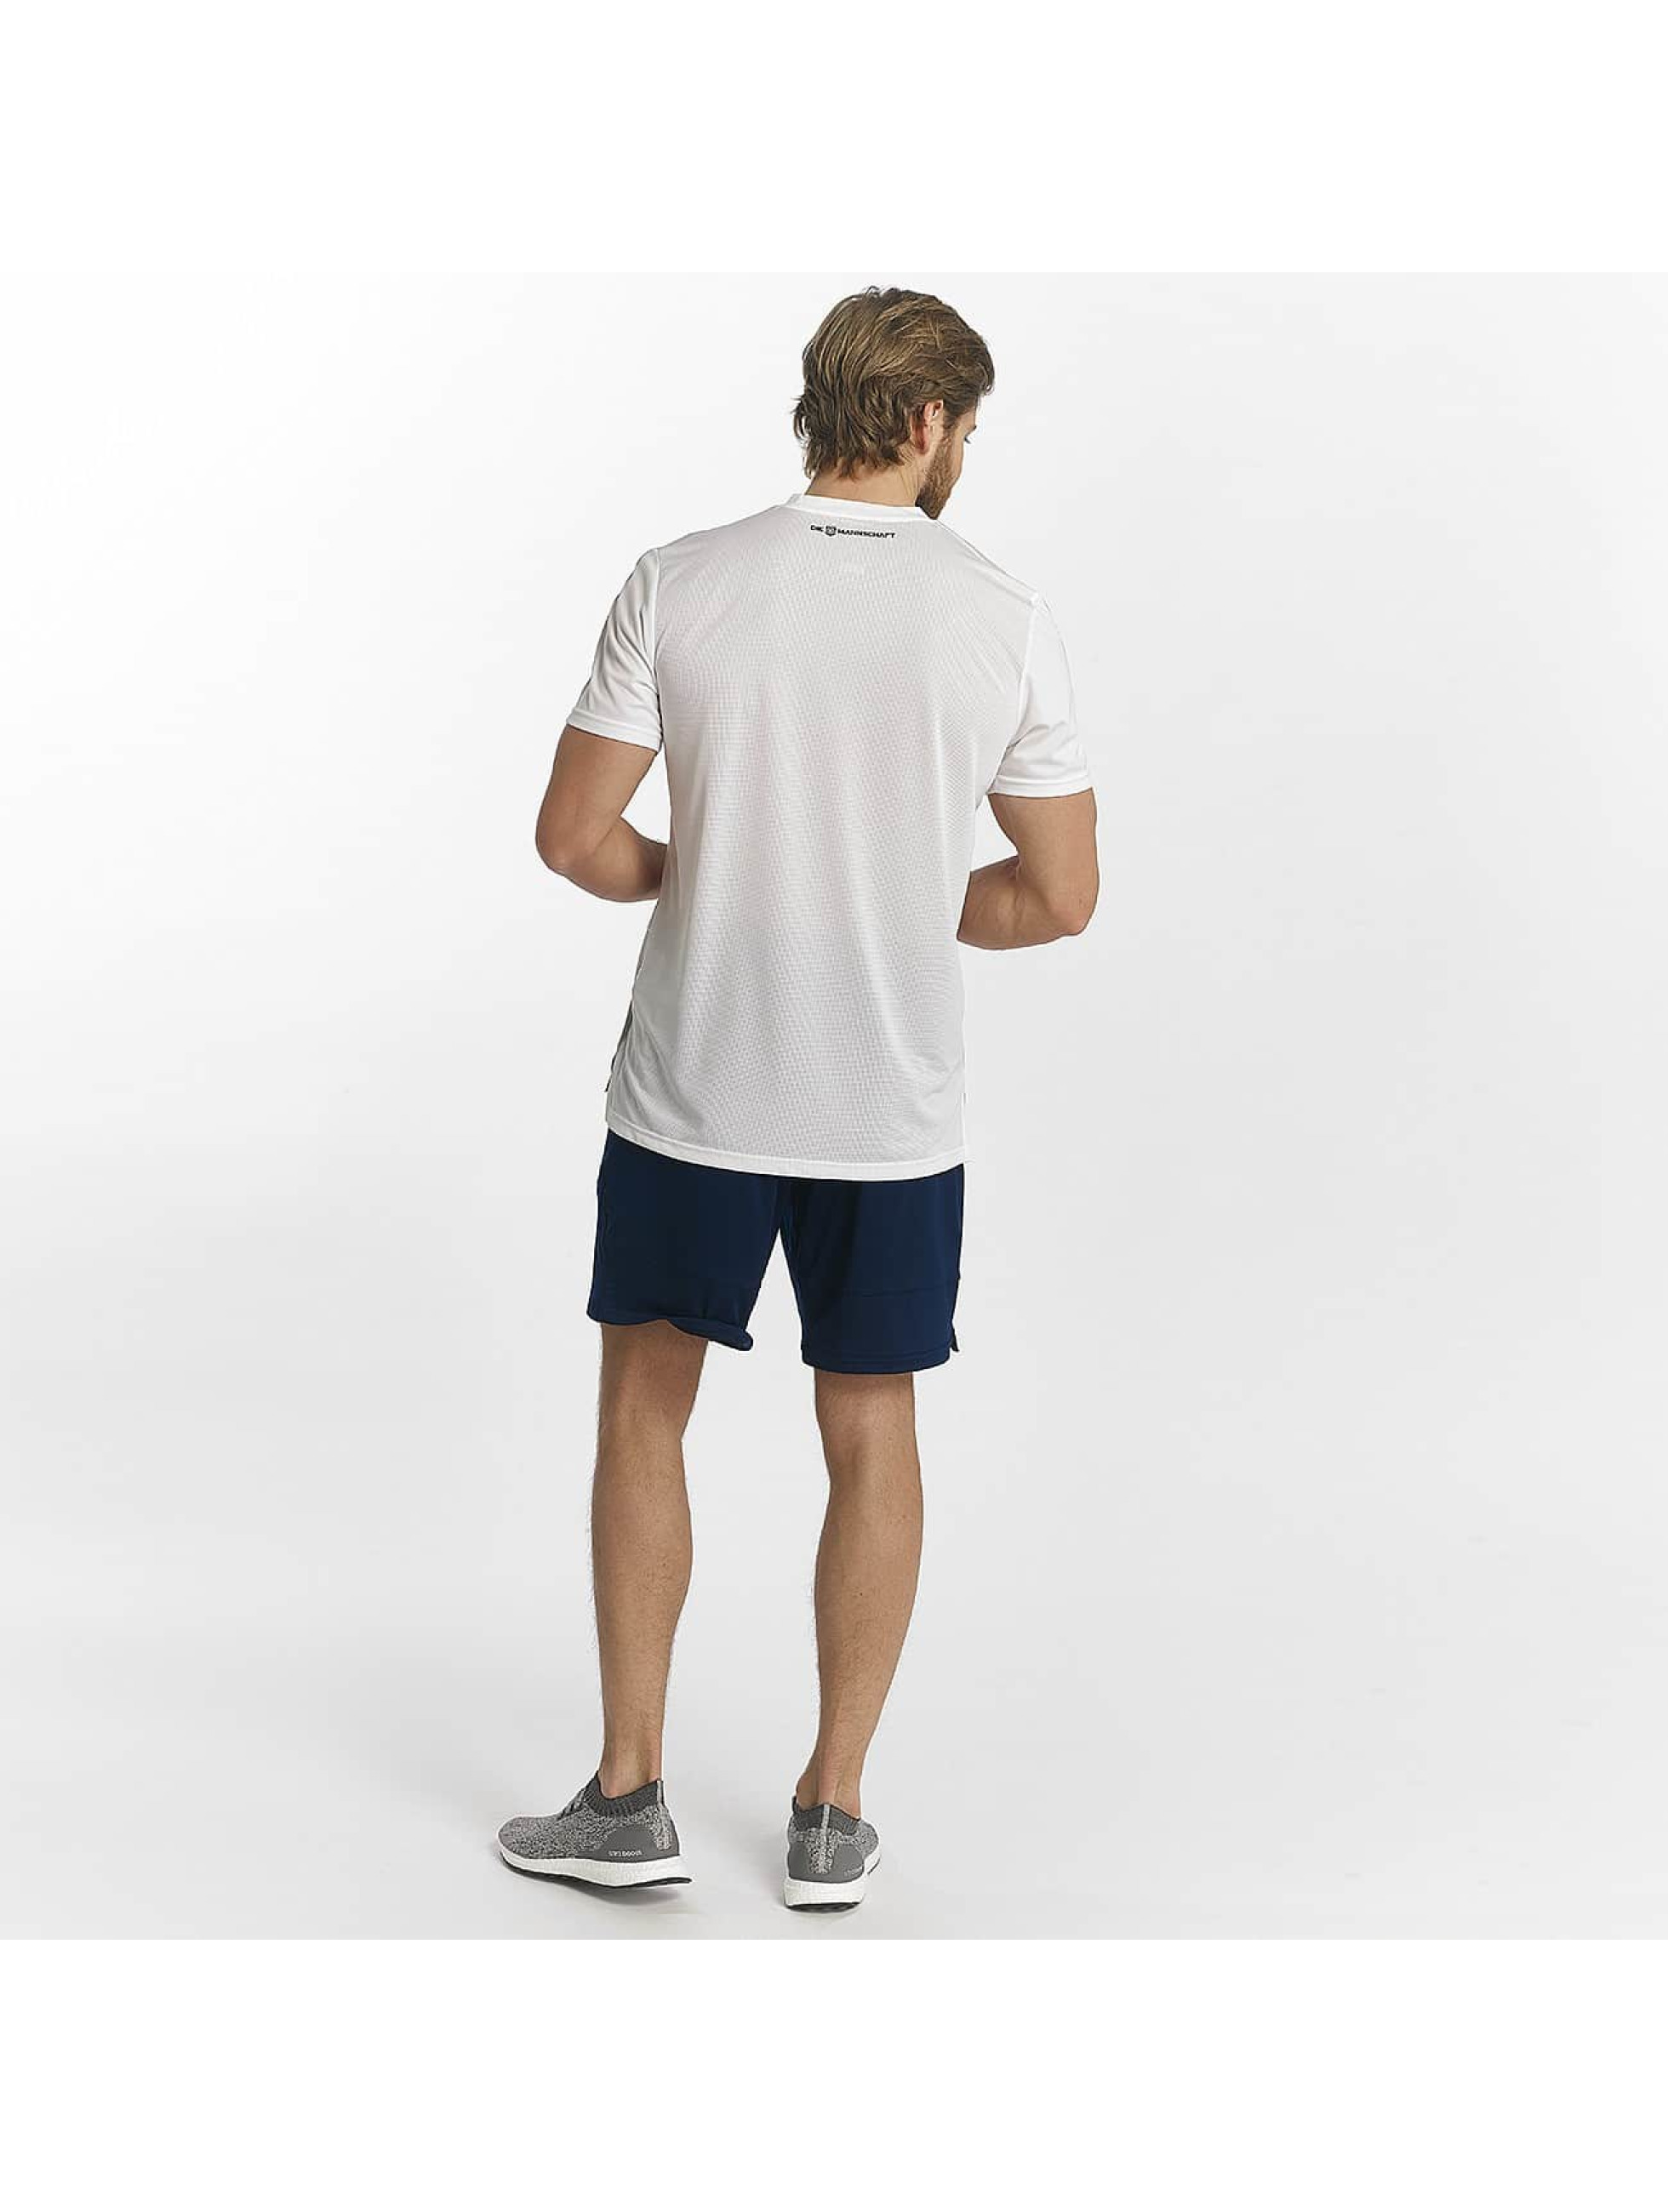 adidas Performance Jersey DFB Training Trikot white